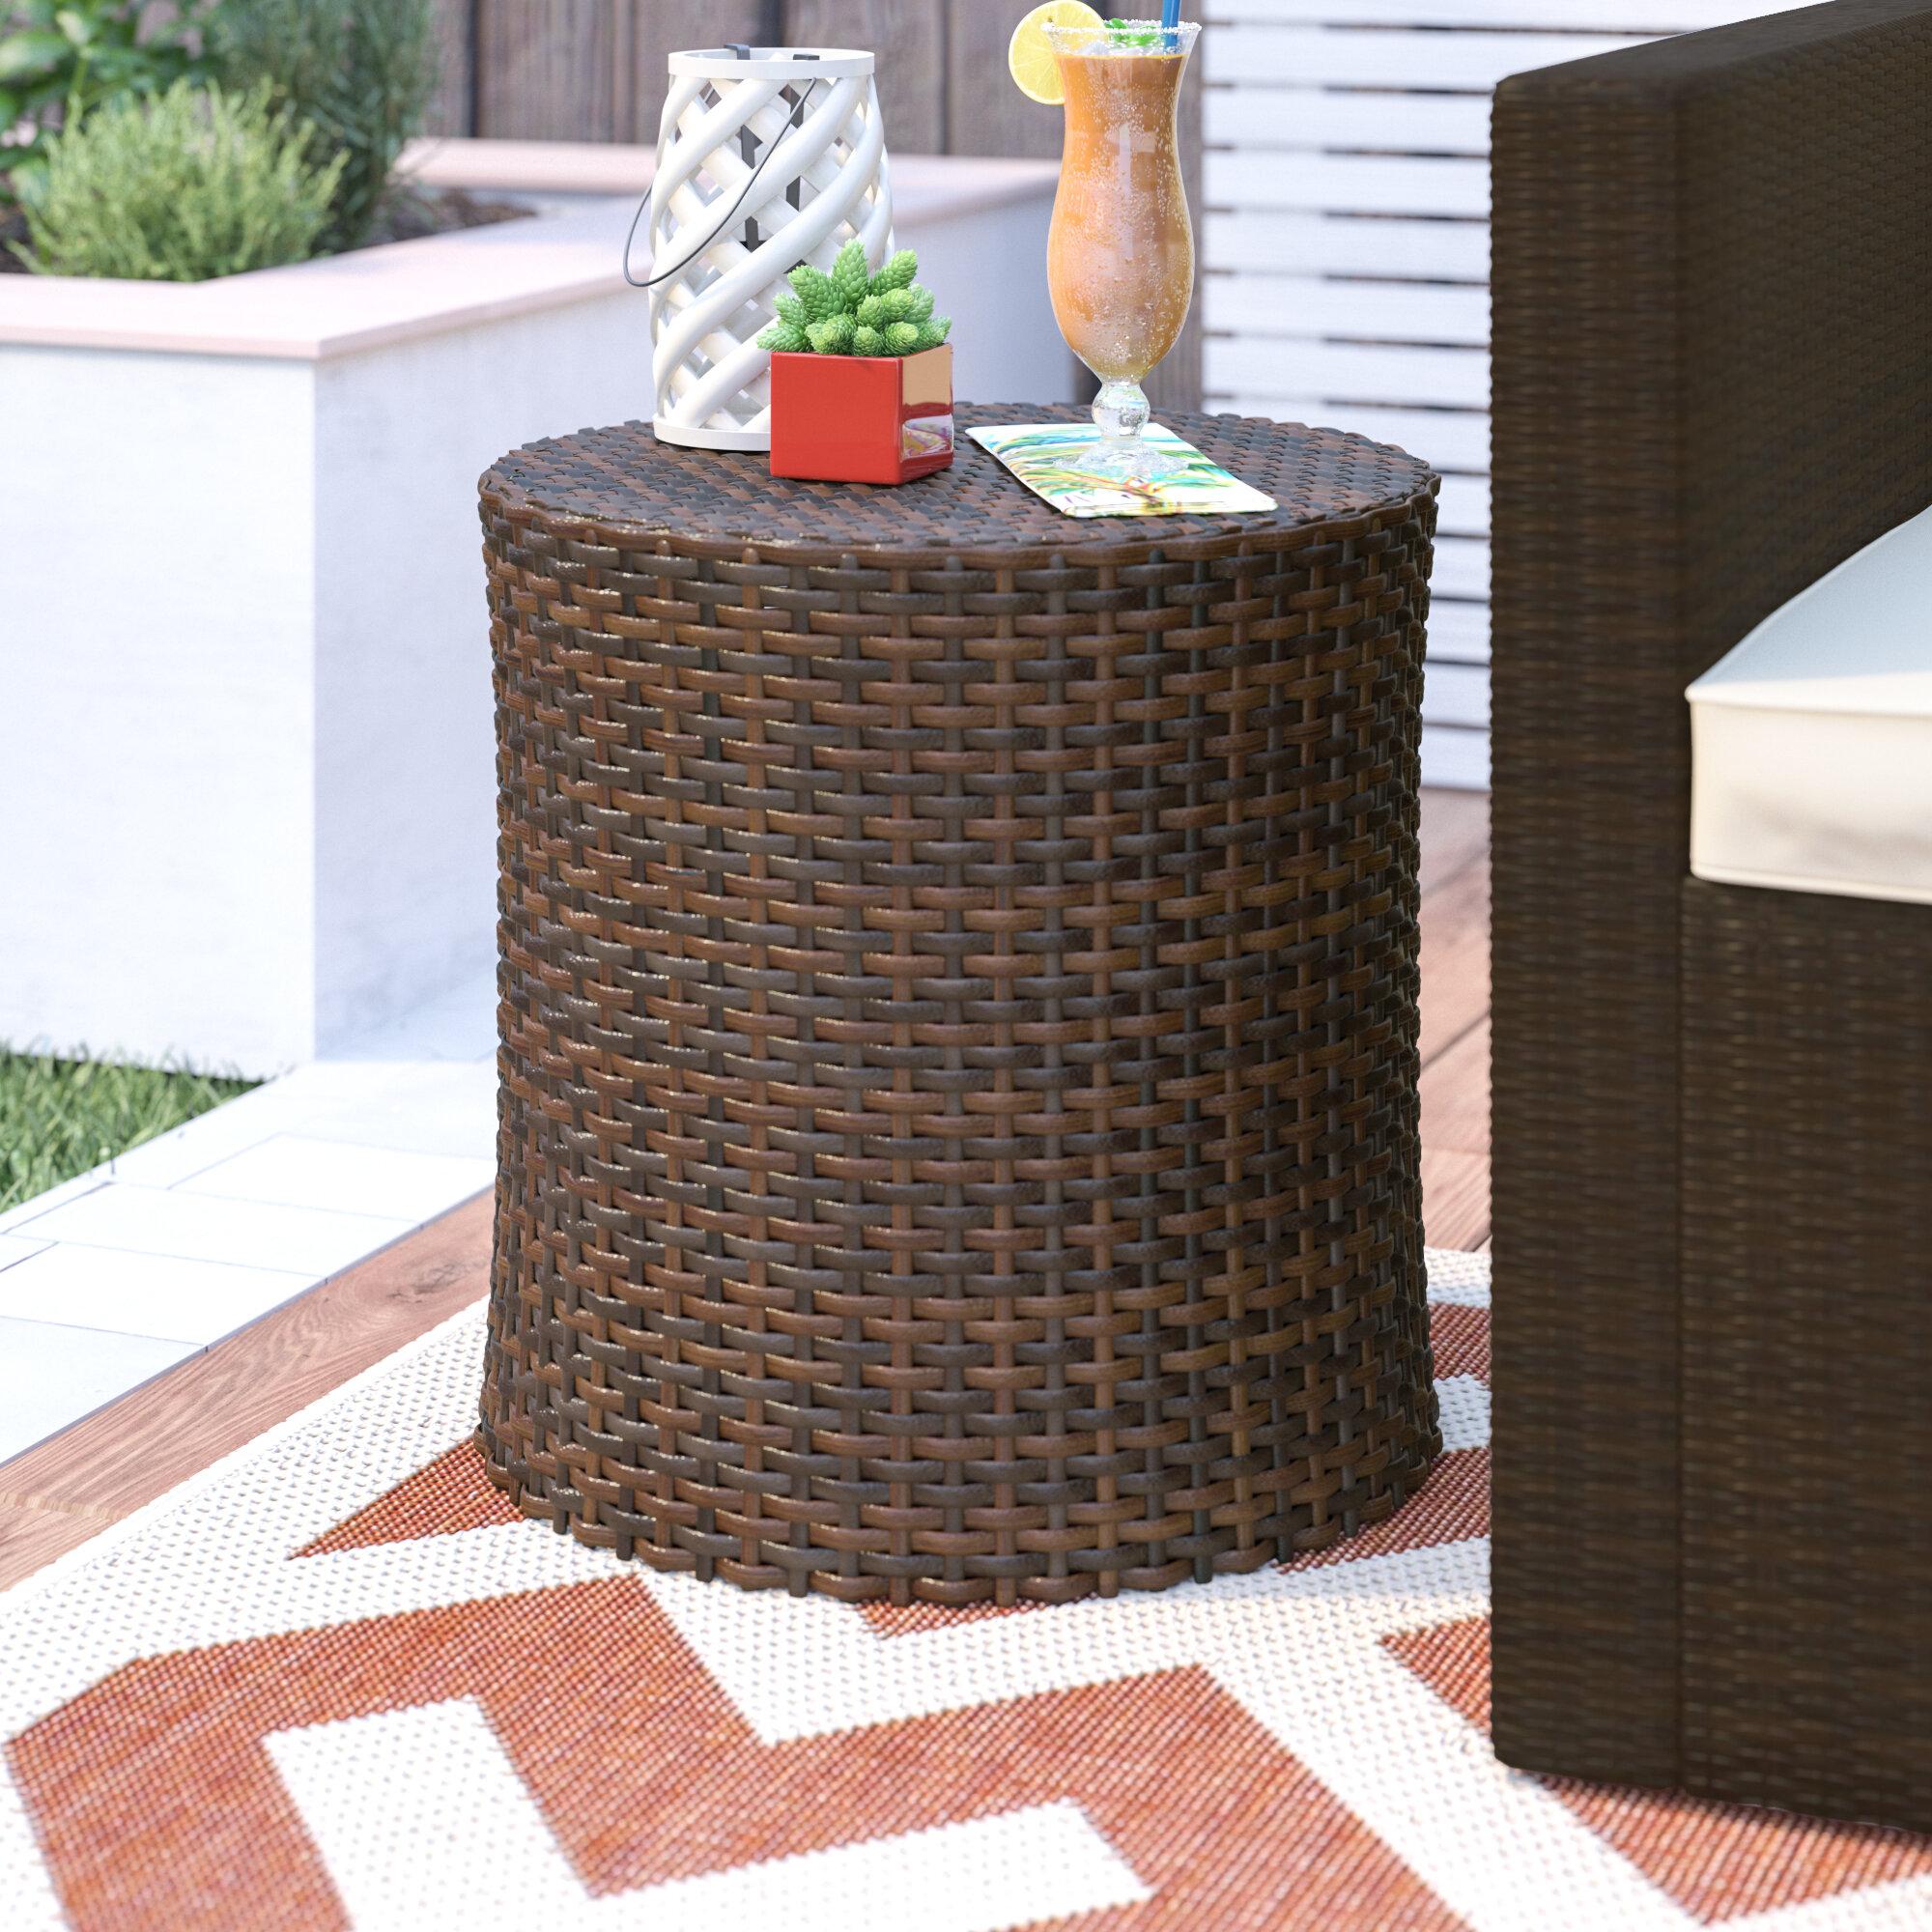 Charmant Mazzella Wicker/Rattan Side Table